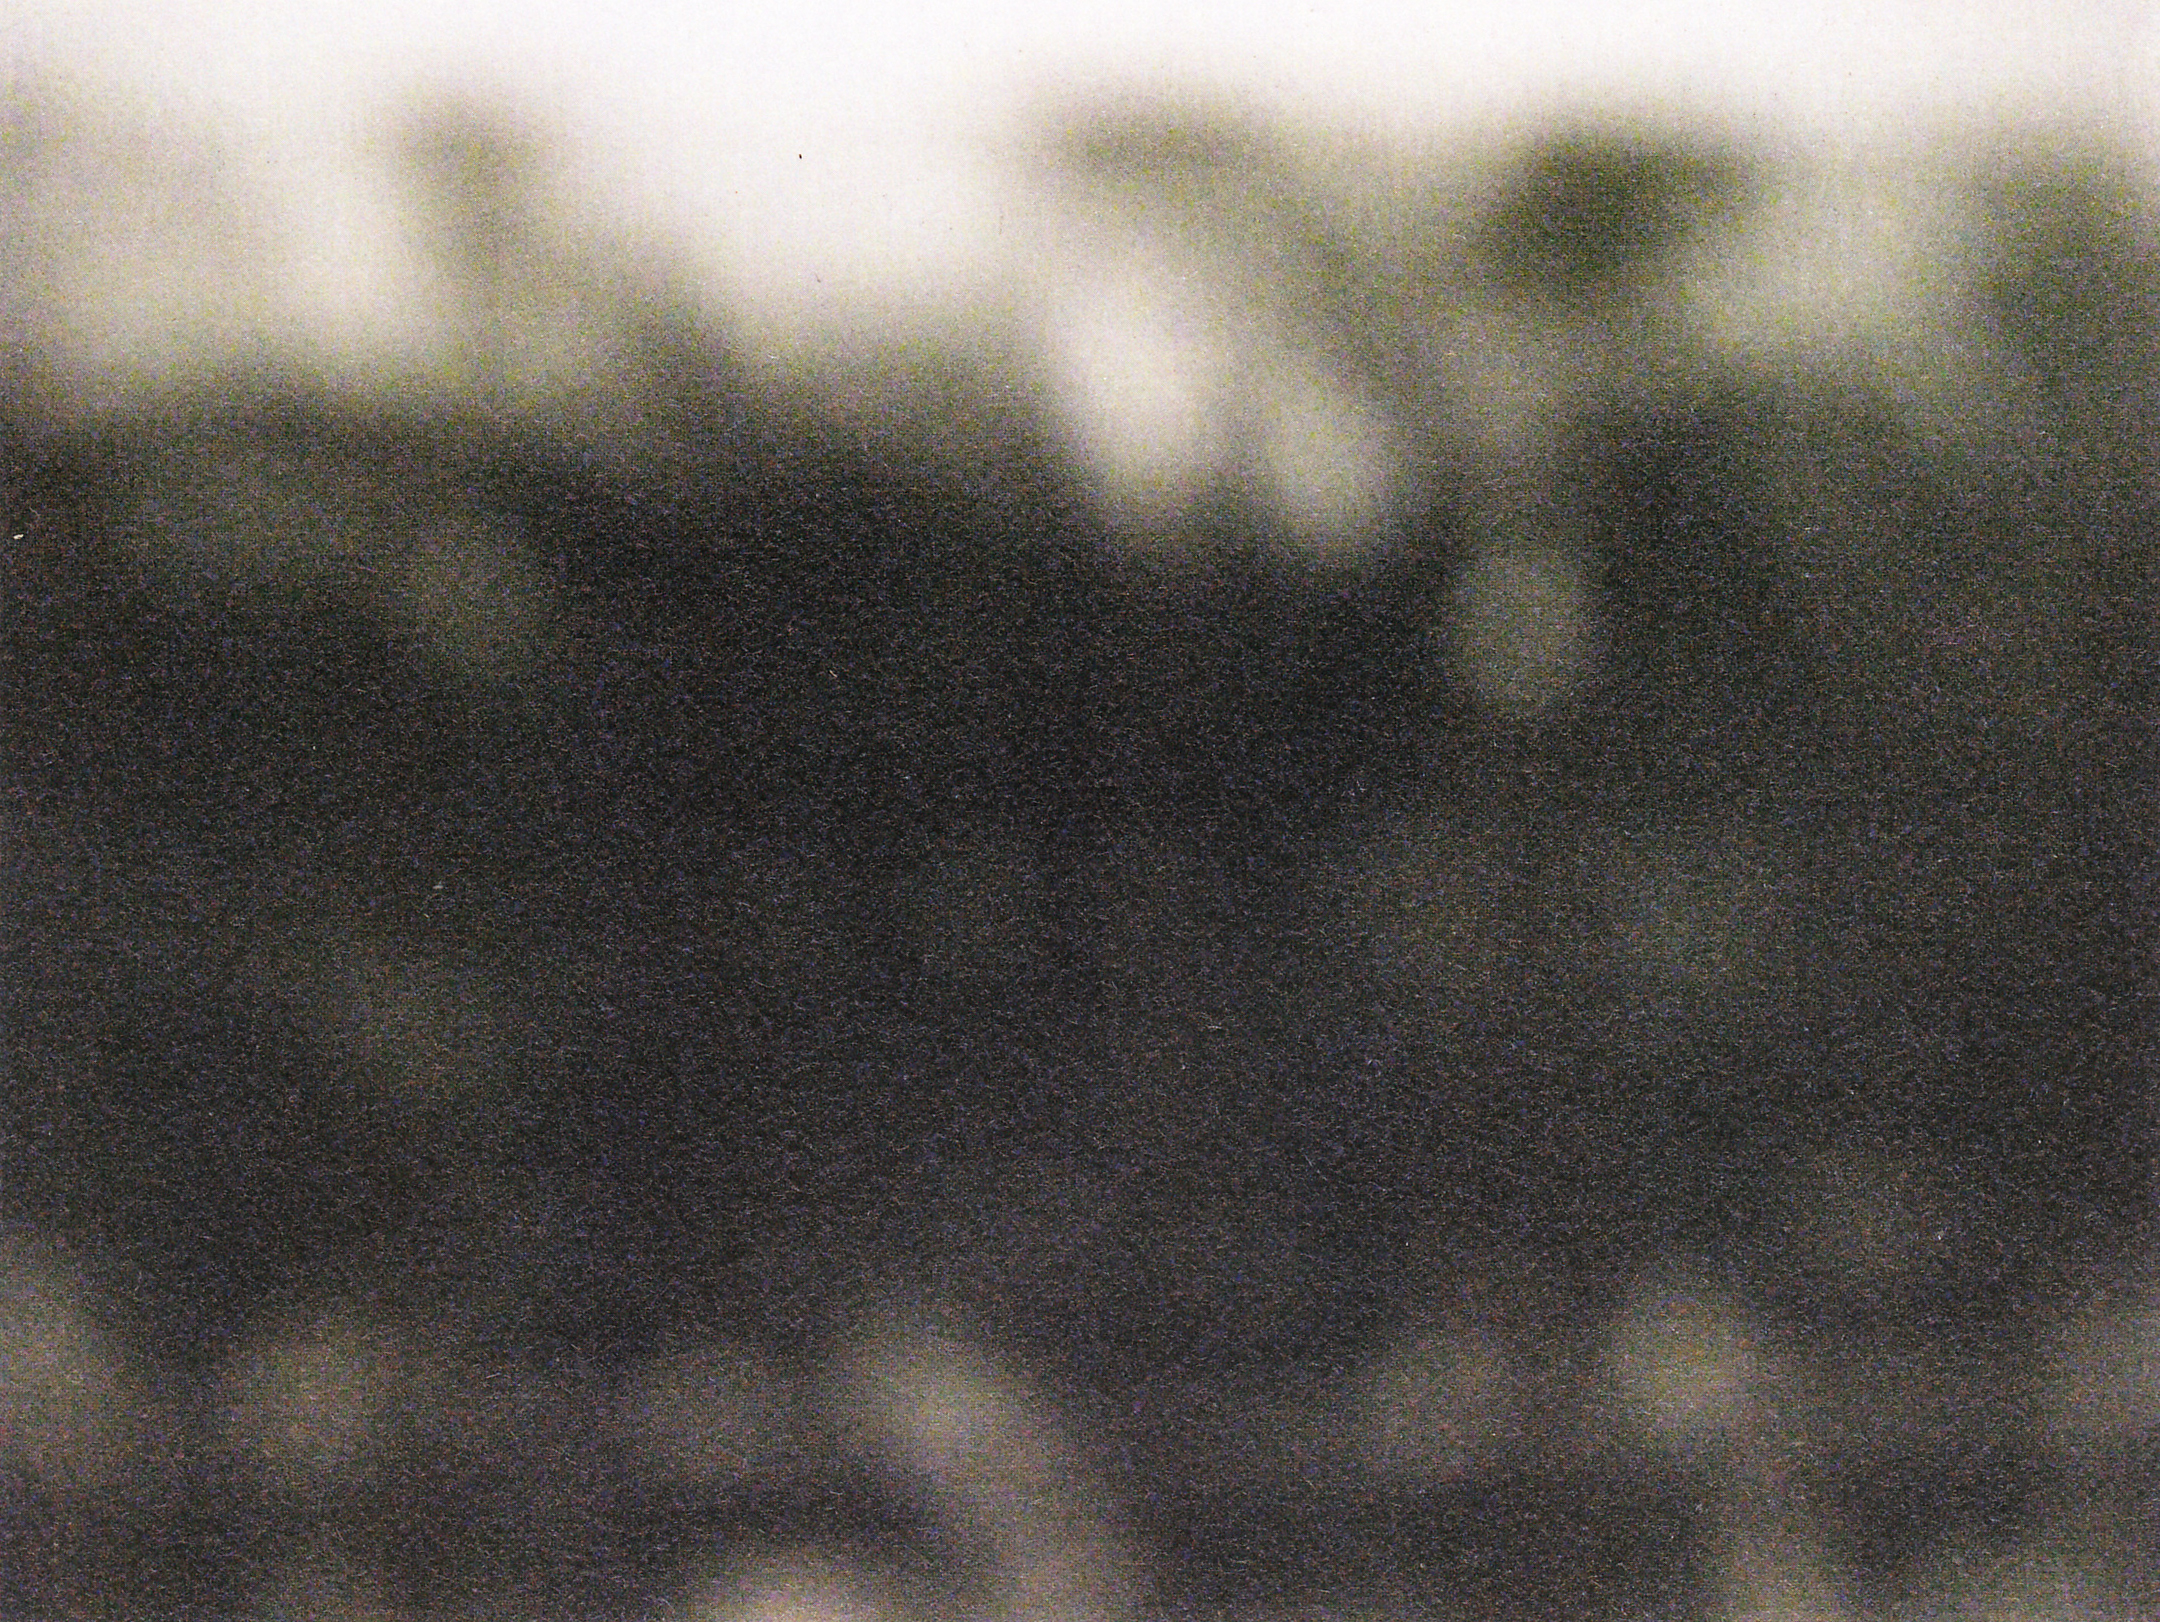 Peng Jian 彭剑, Landscape 3 风景之三, 2009, Photography 摄影